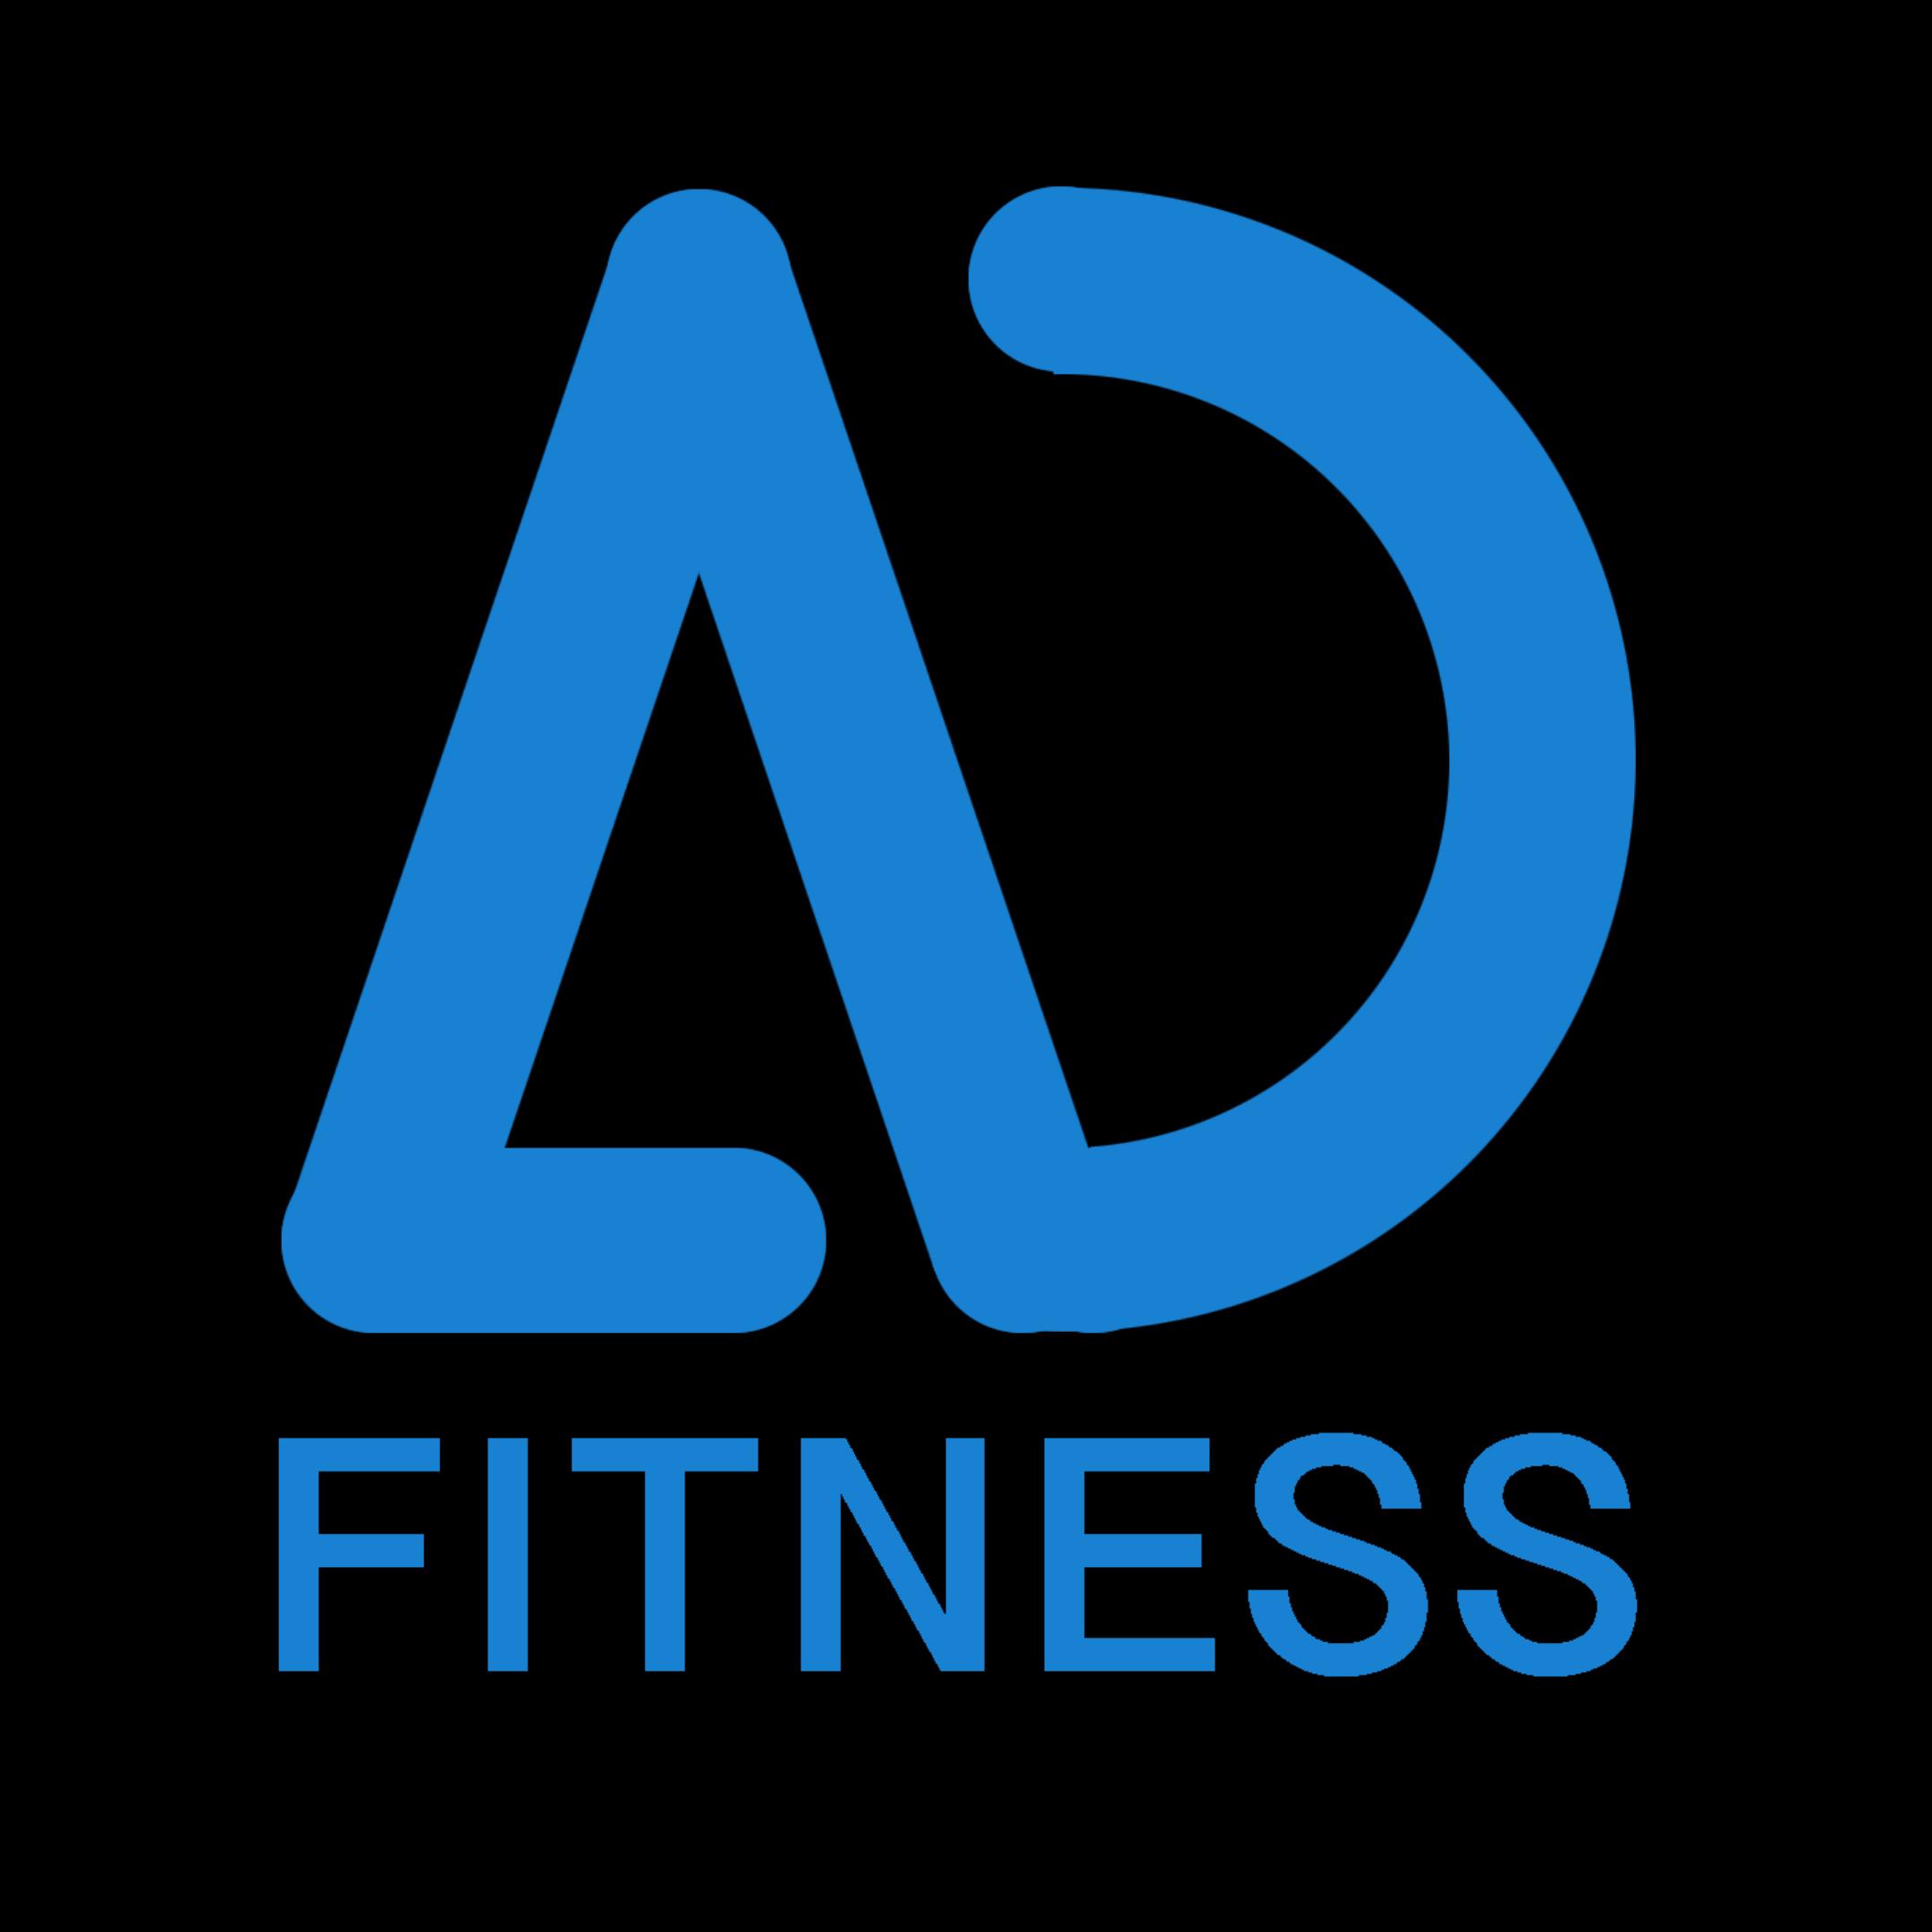 AD Fitness